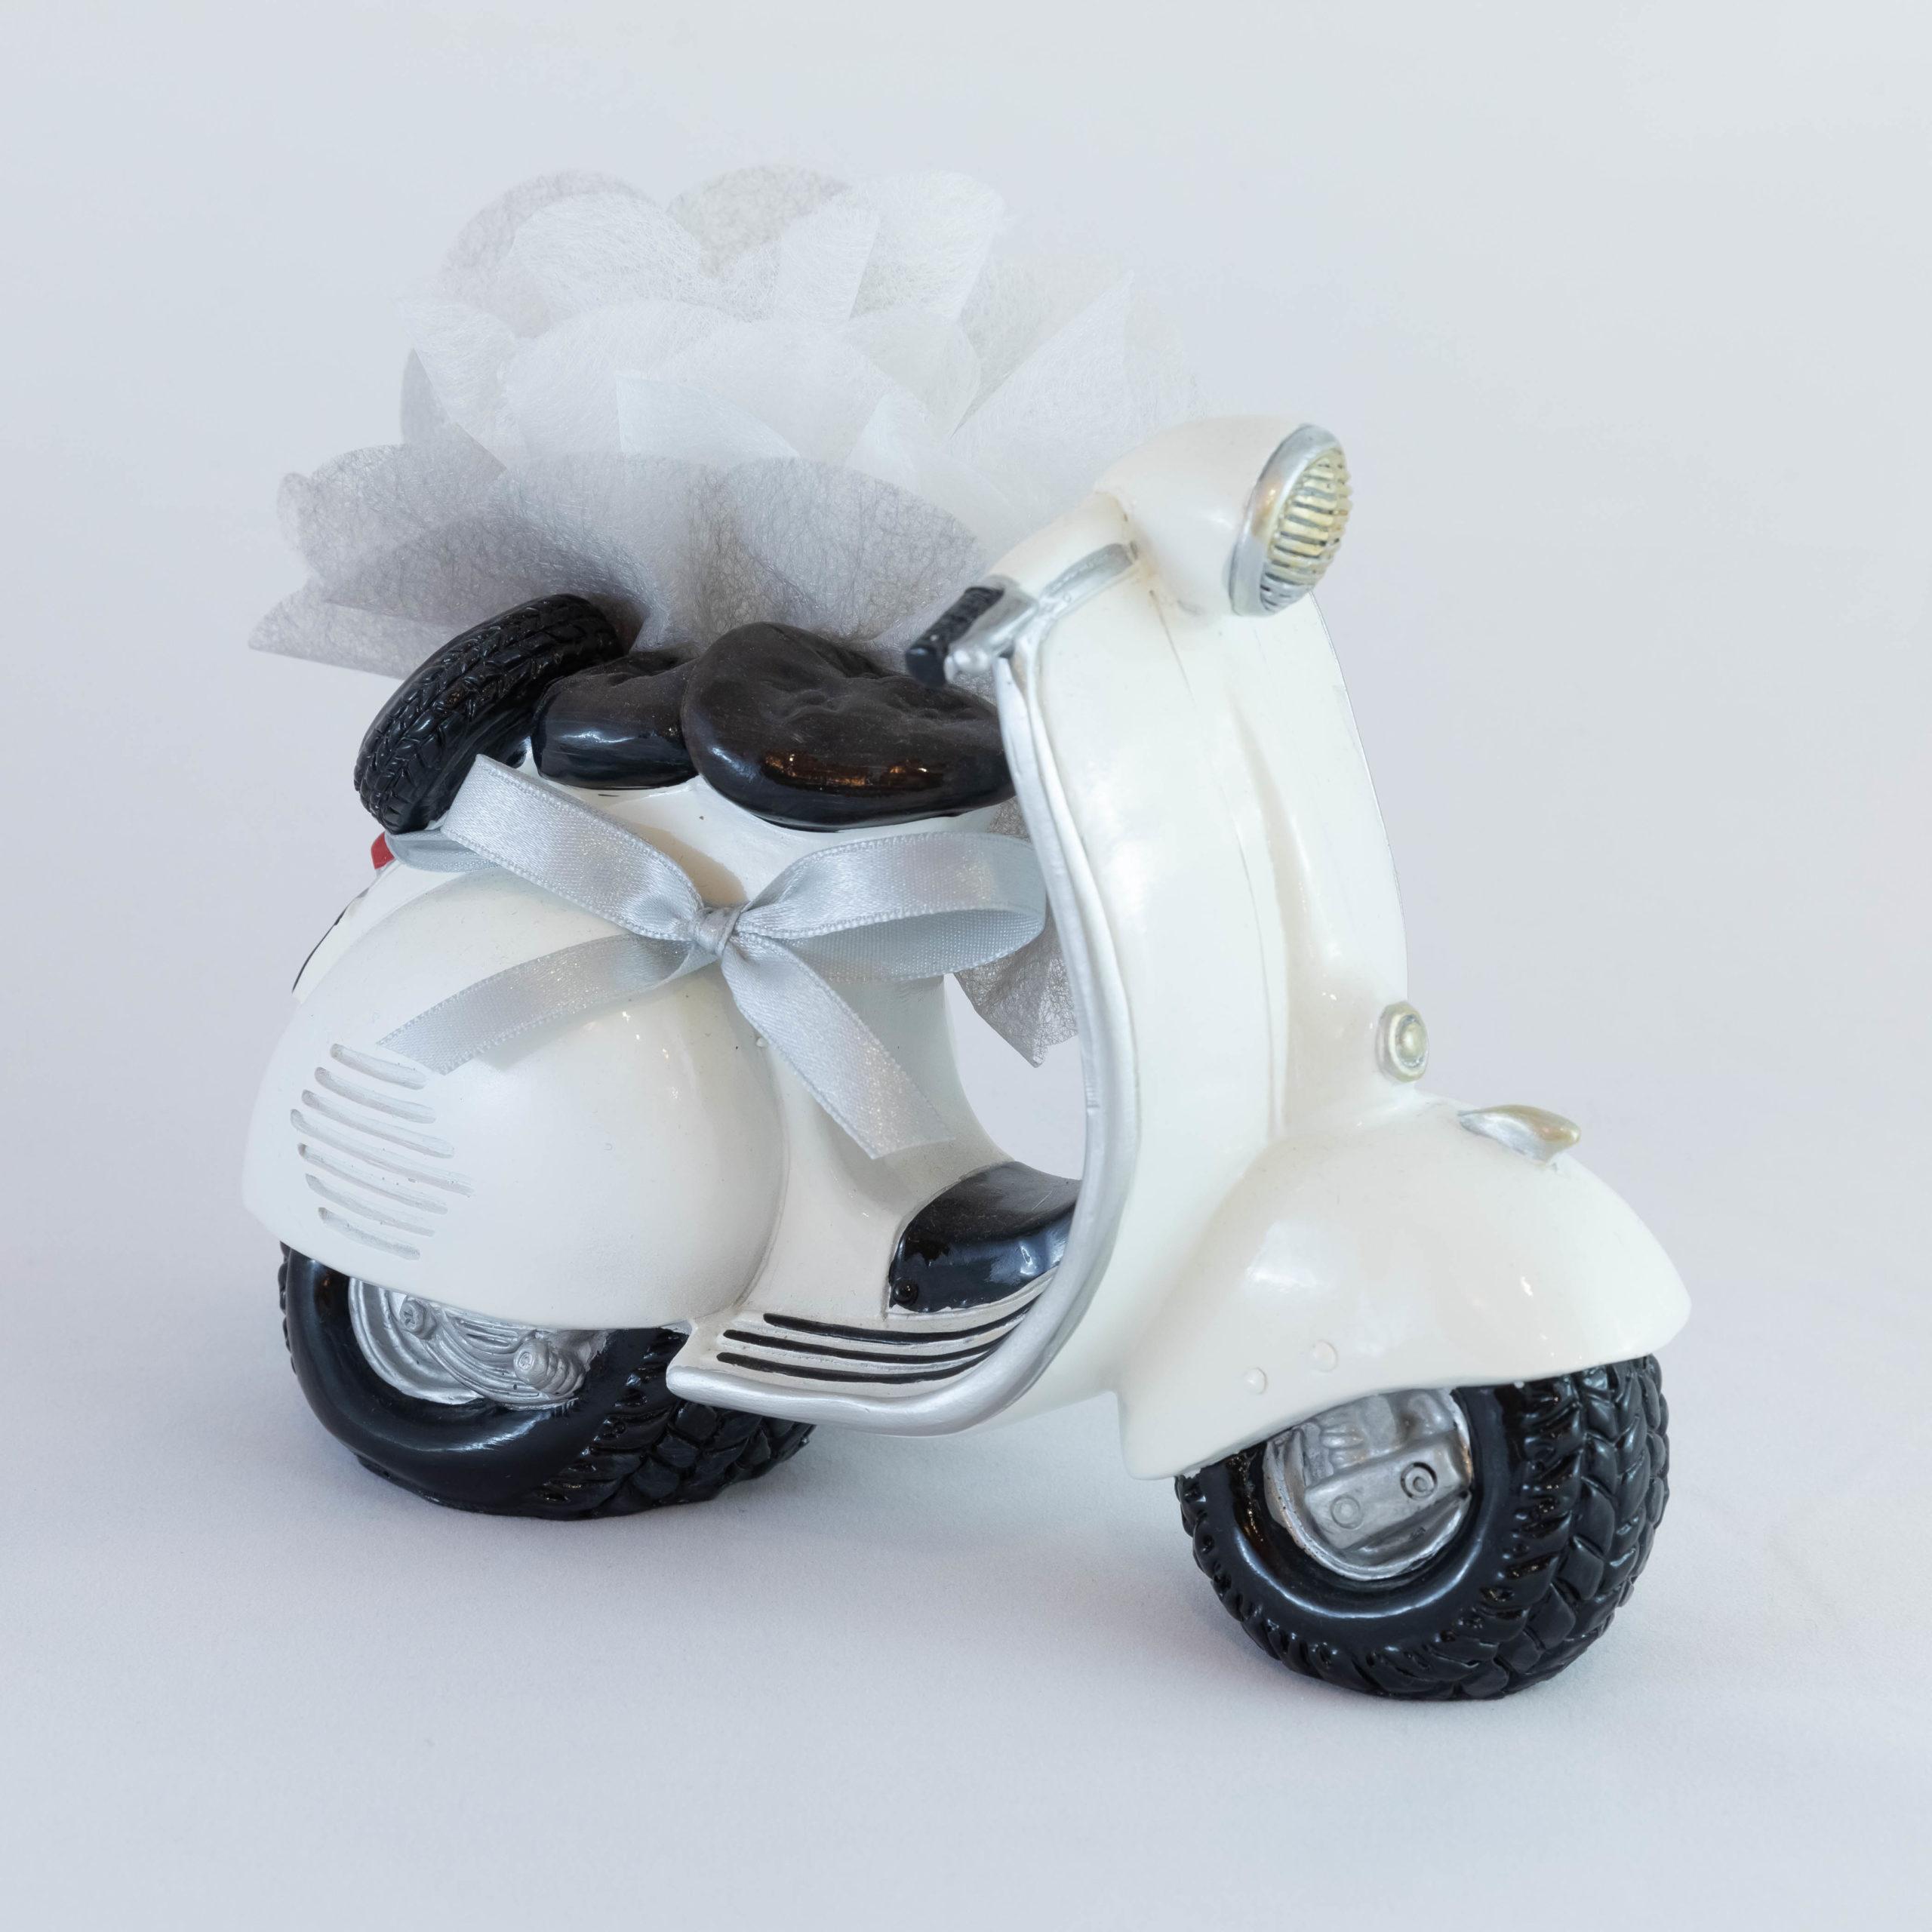 Scooter blanc Tirelire - Véhicule Image